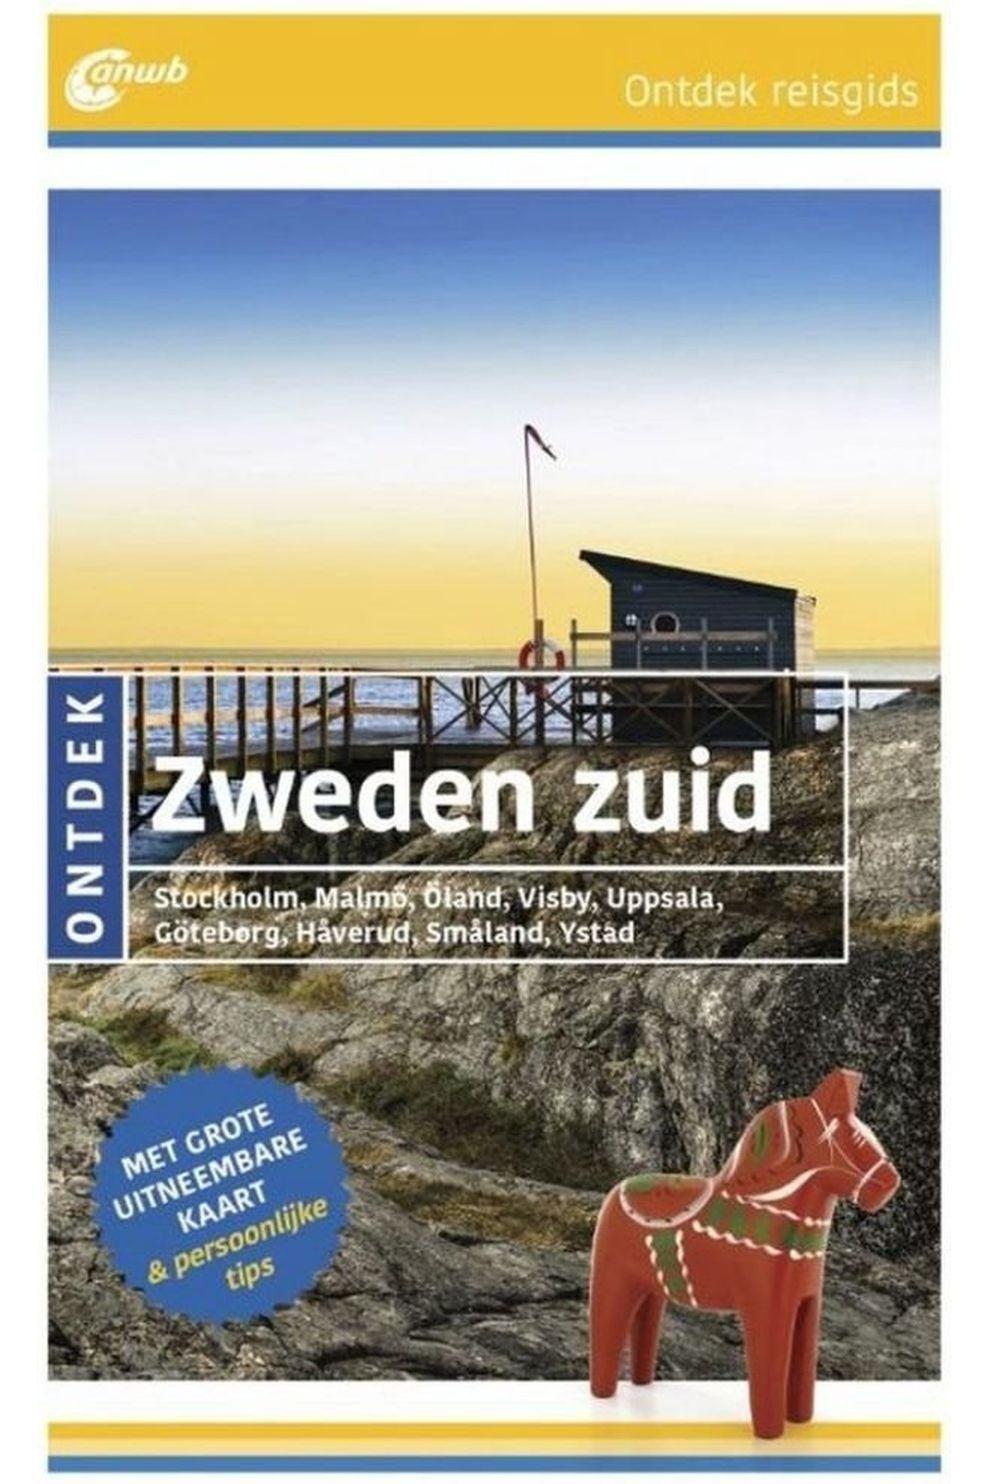 ANWB Zweden Zuid Ontdek Anwb - 2018